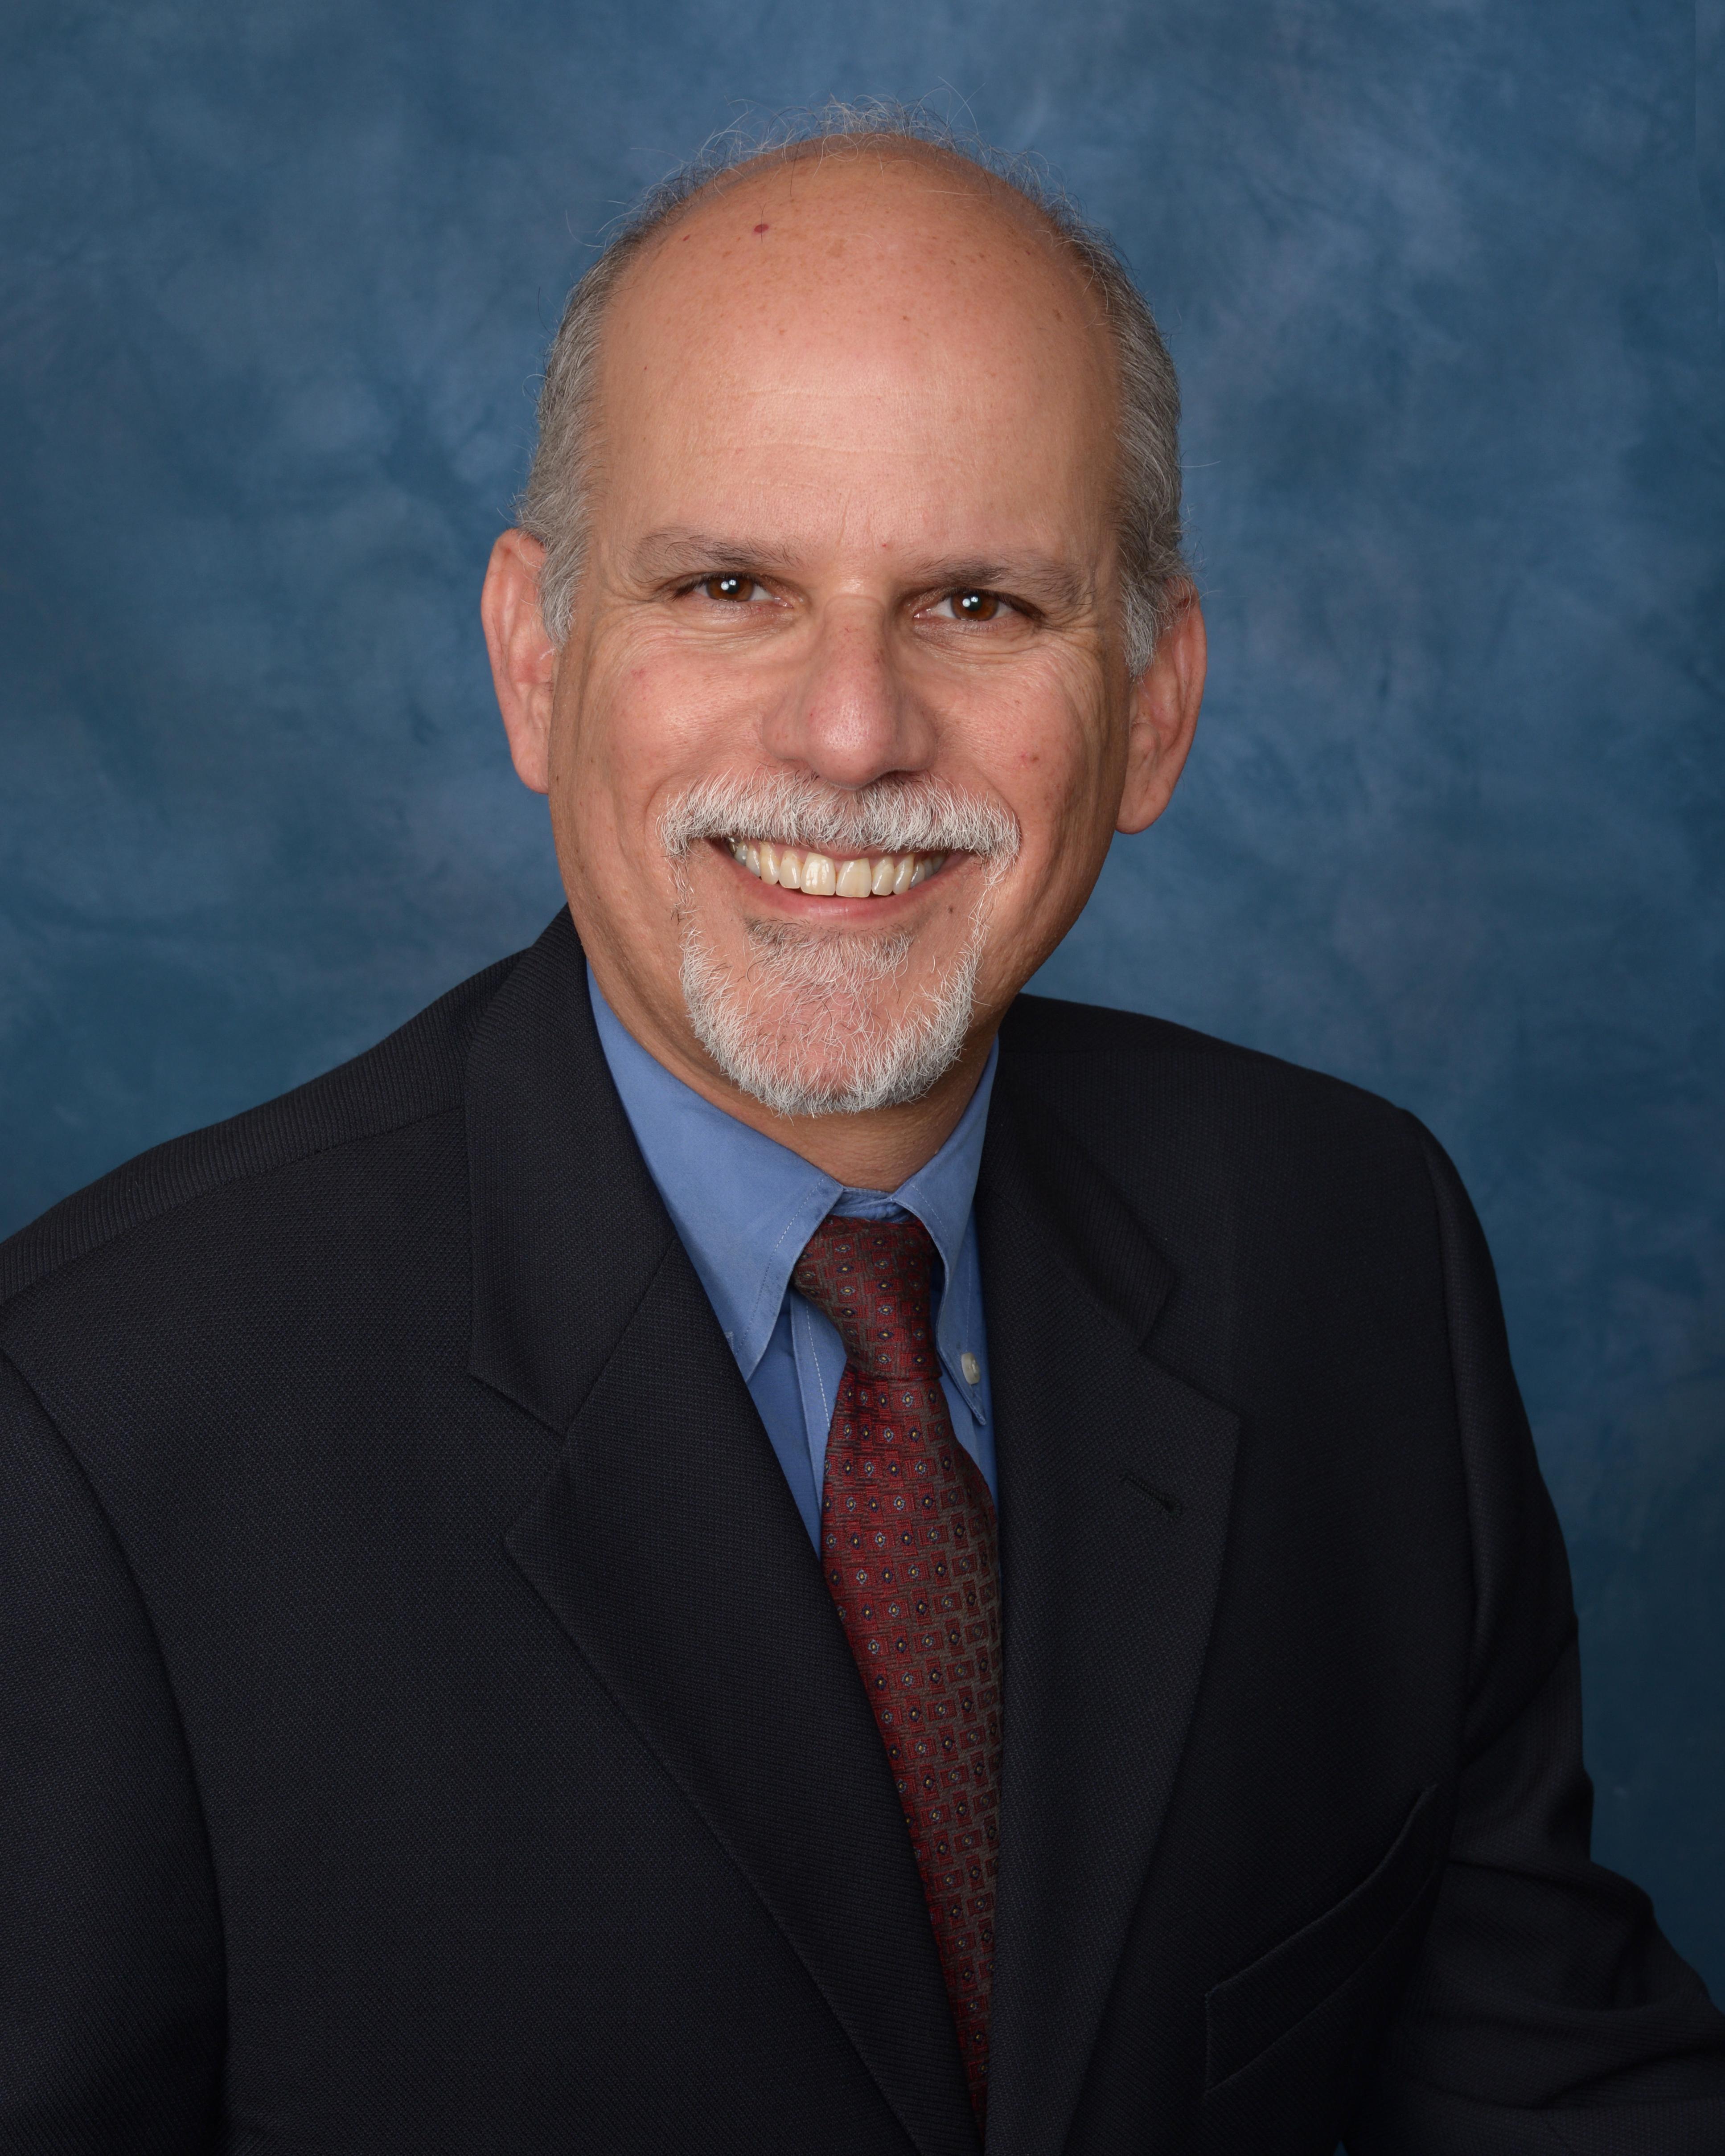 Bruce Winkelman